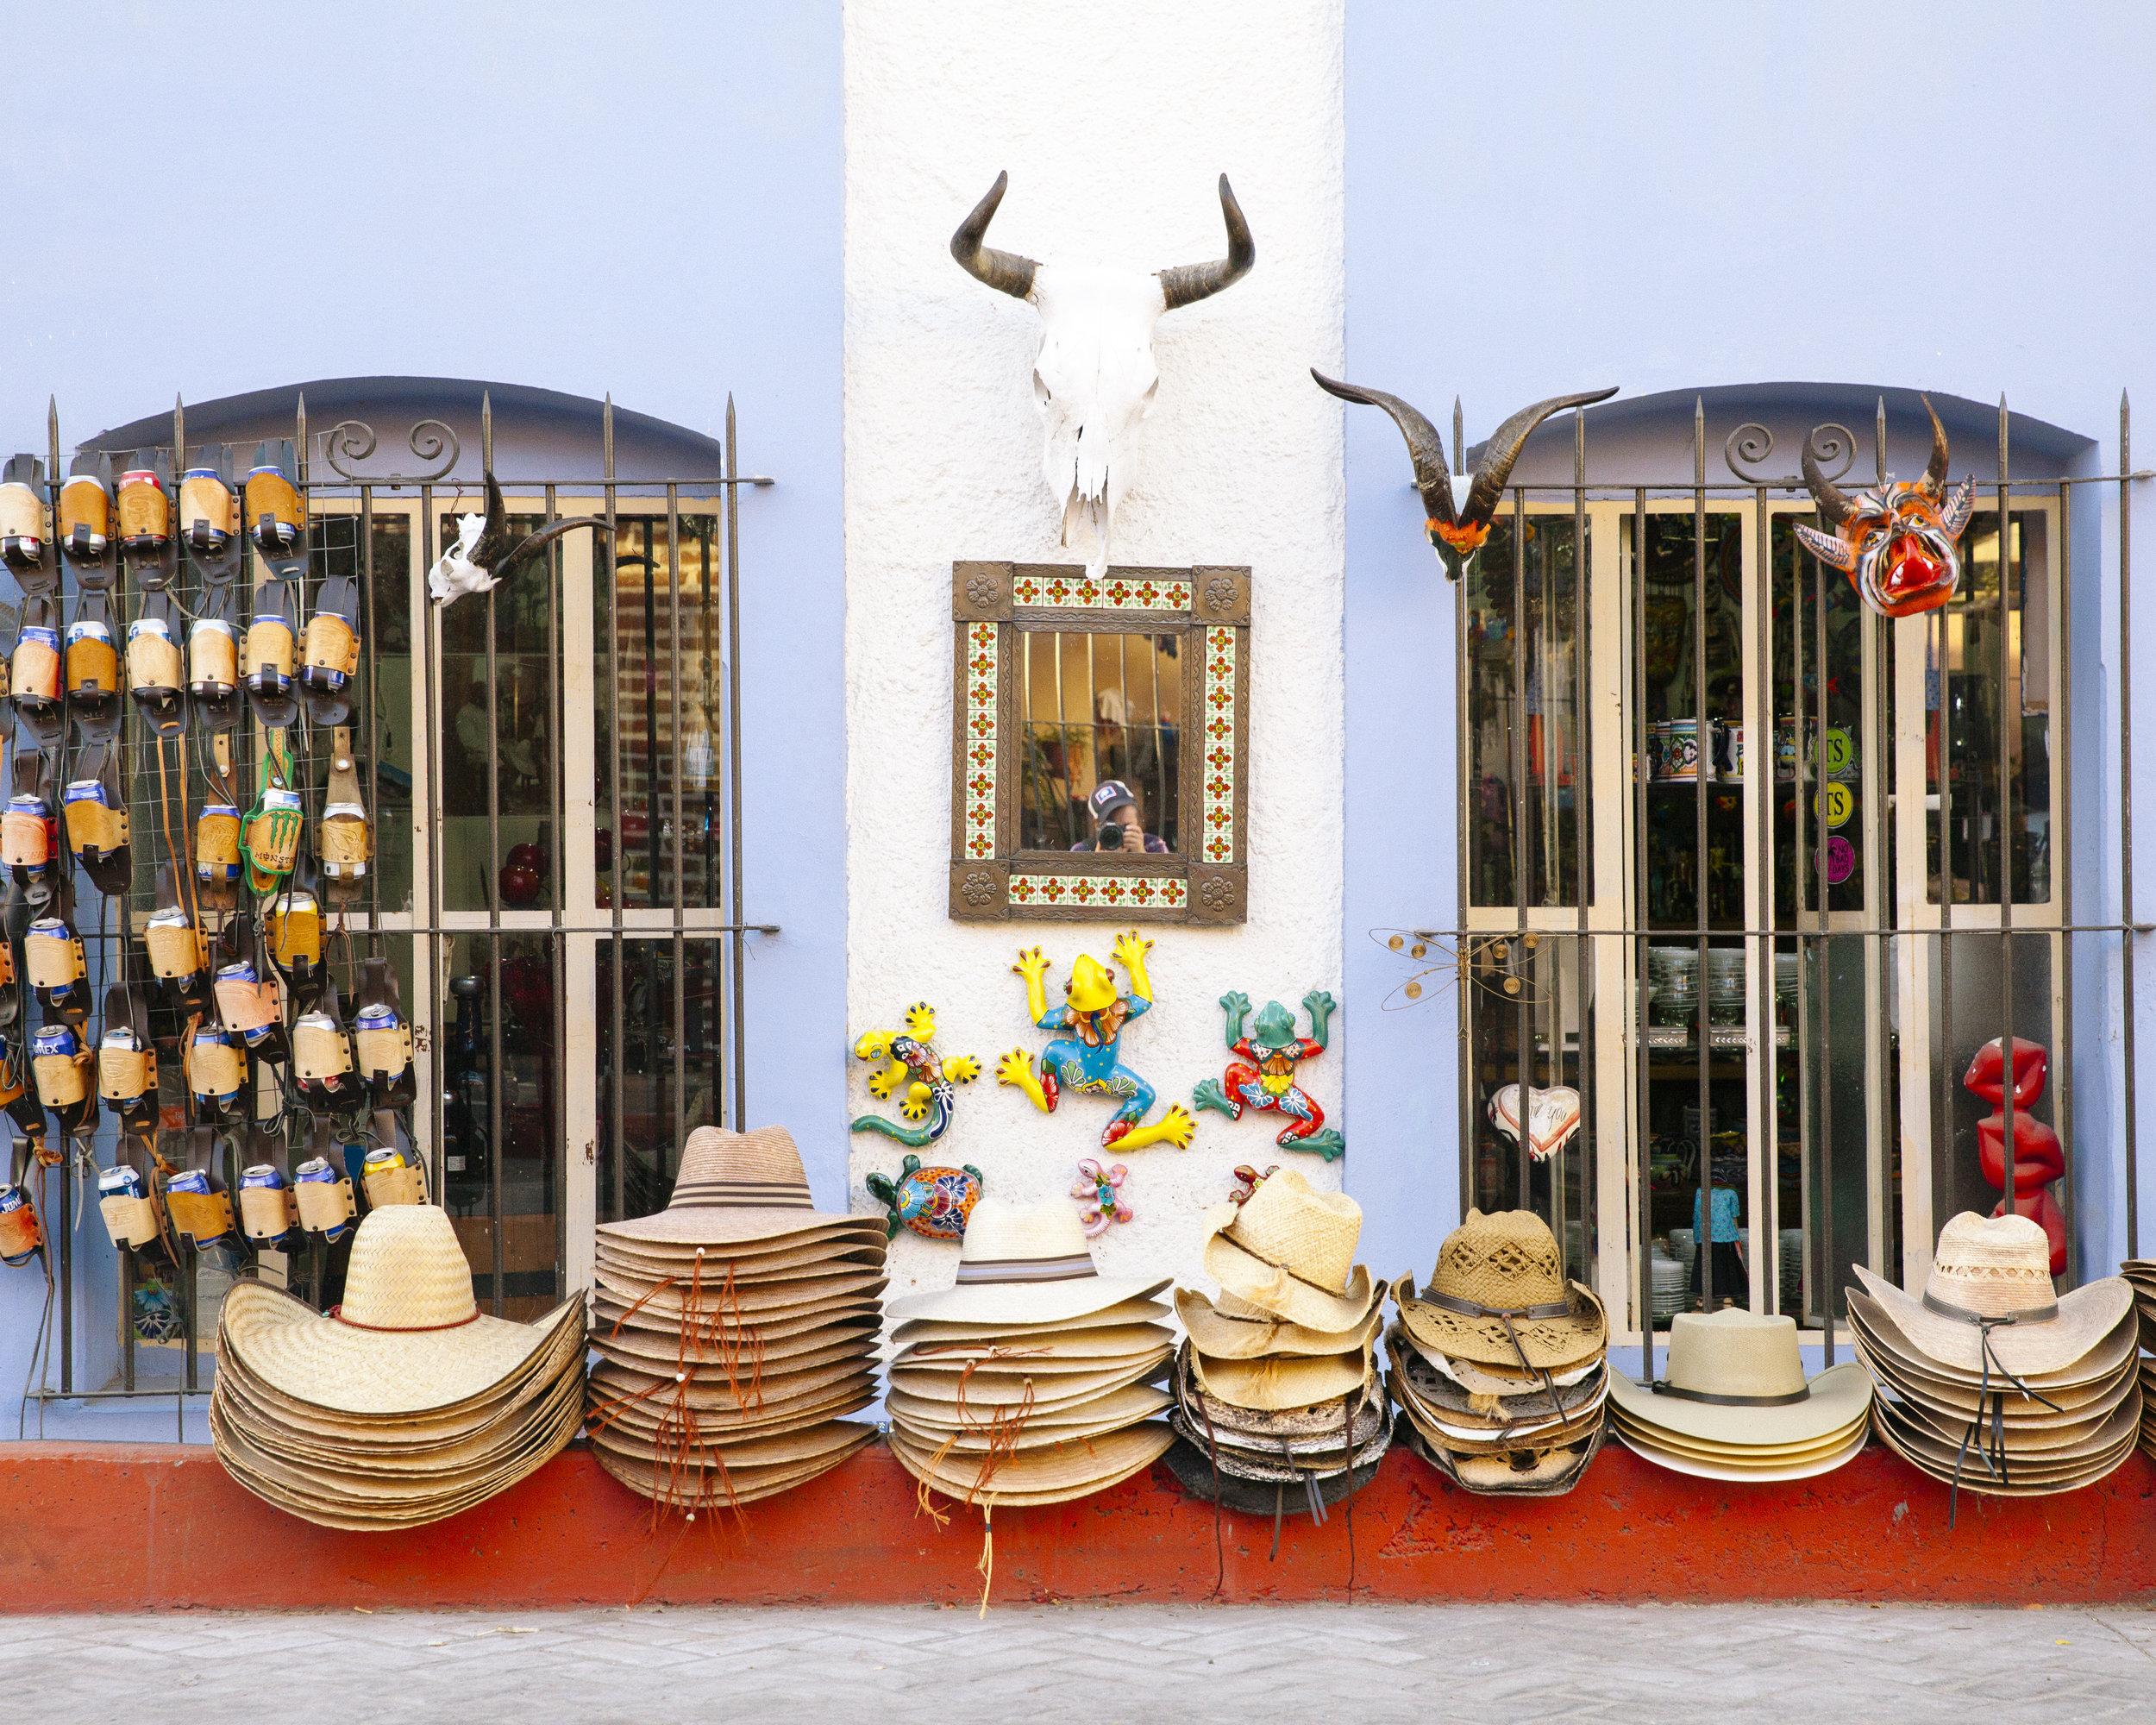 Helynn_Ospina_Travel_Mexico_Baja_Todos_Santos_1736019.jpg